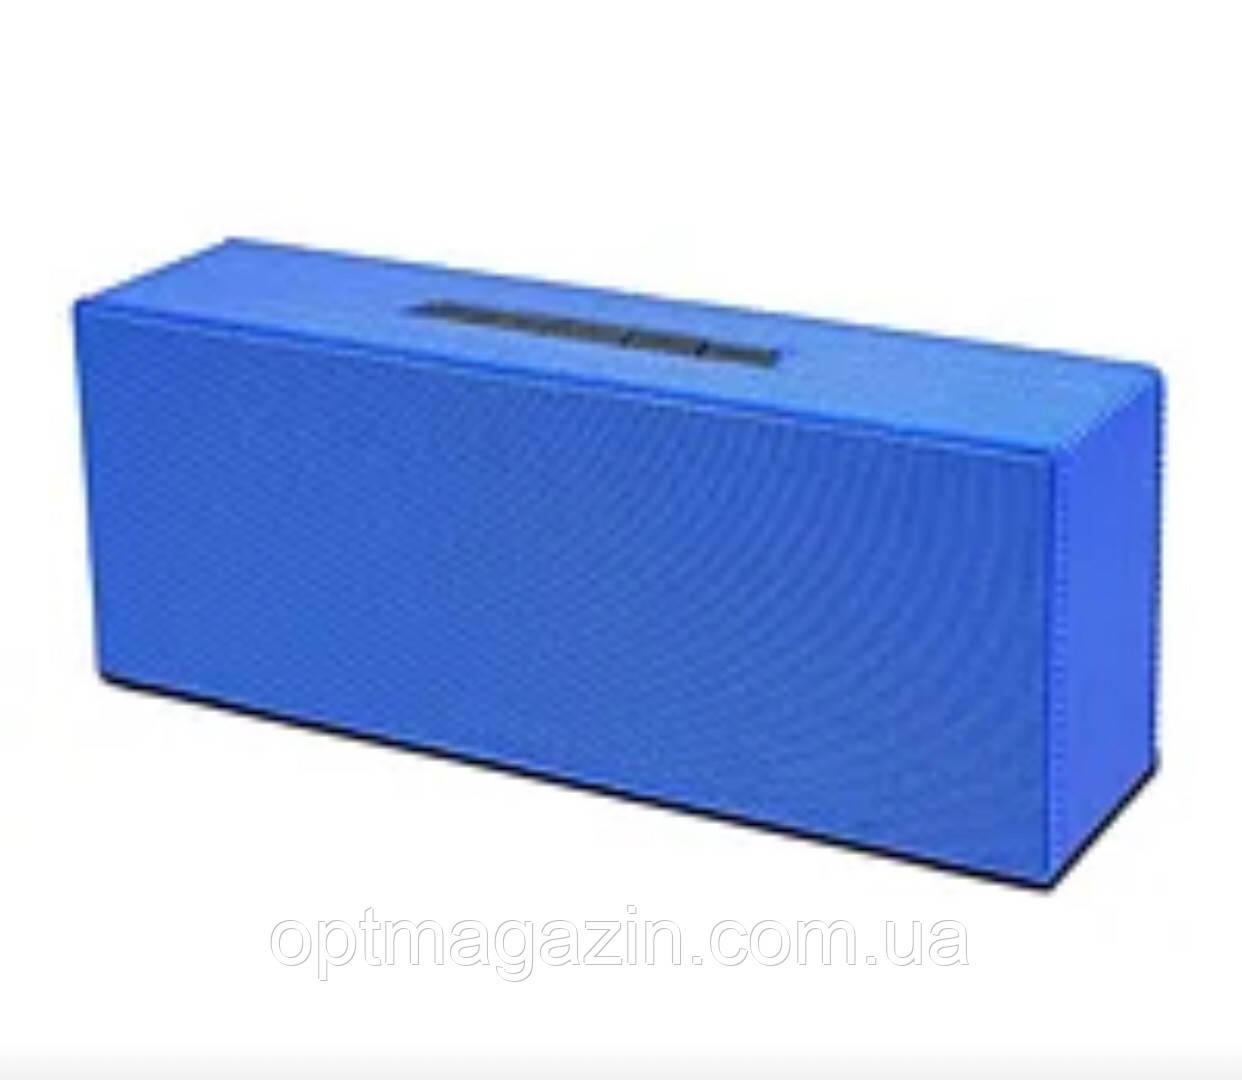 Портативная колонка AT-7708 (USB+Bluetooth+FM + Led дисплей) blue